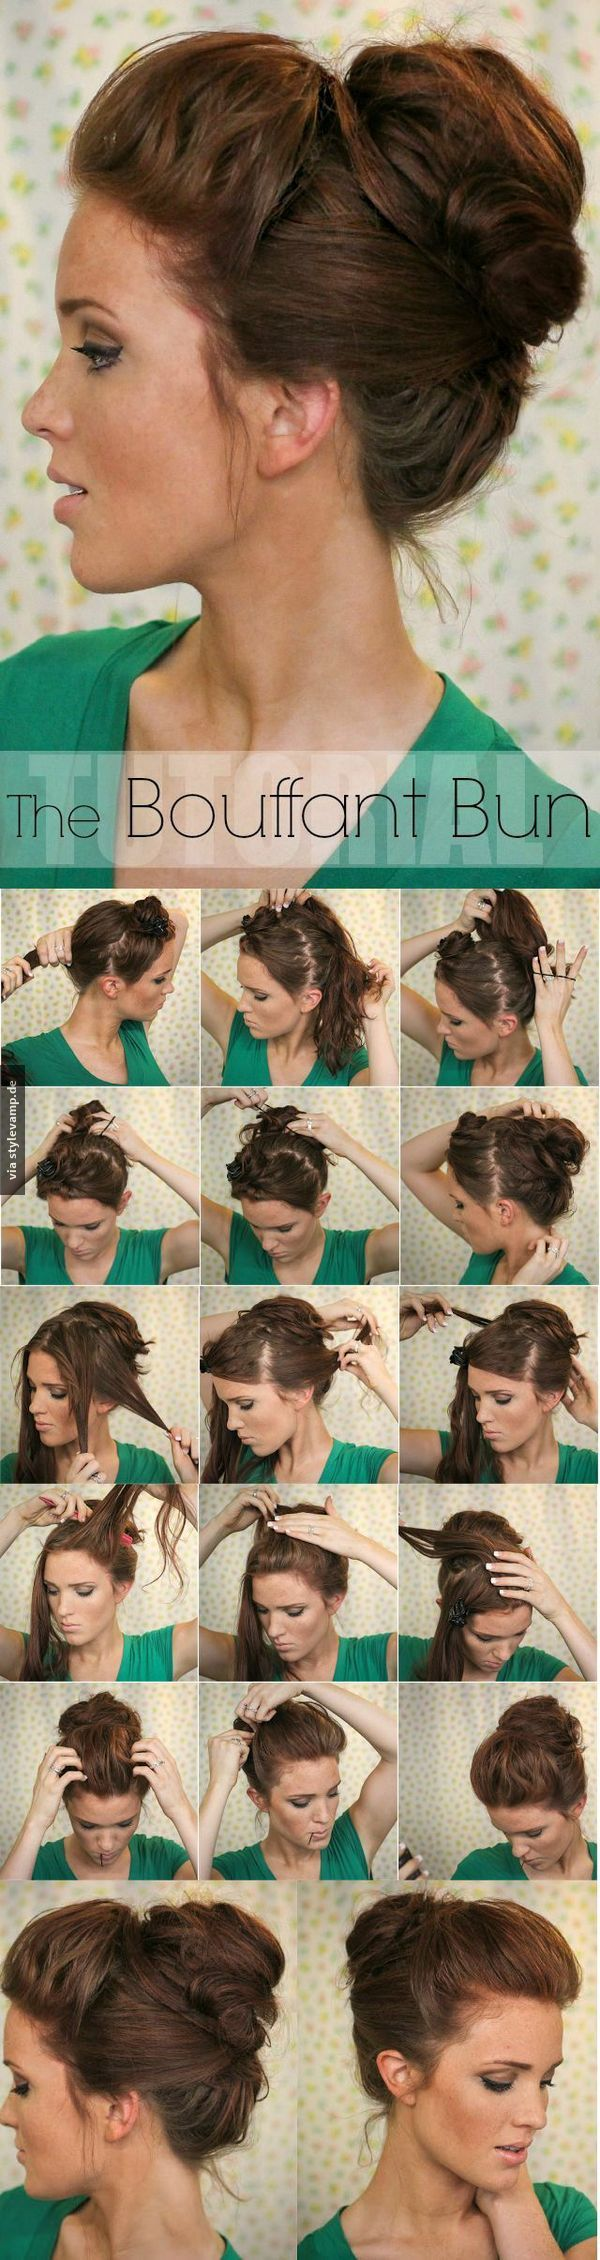 Bouffant bun uc frisur pinterest bouffant bun hair style and